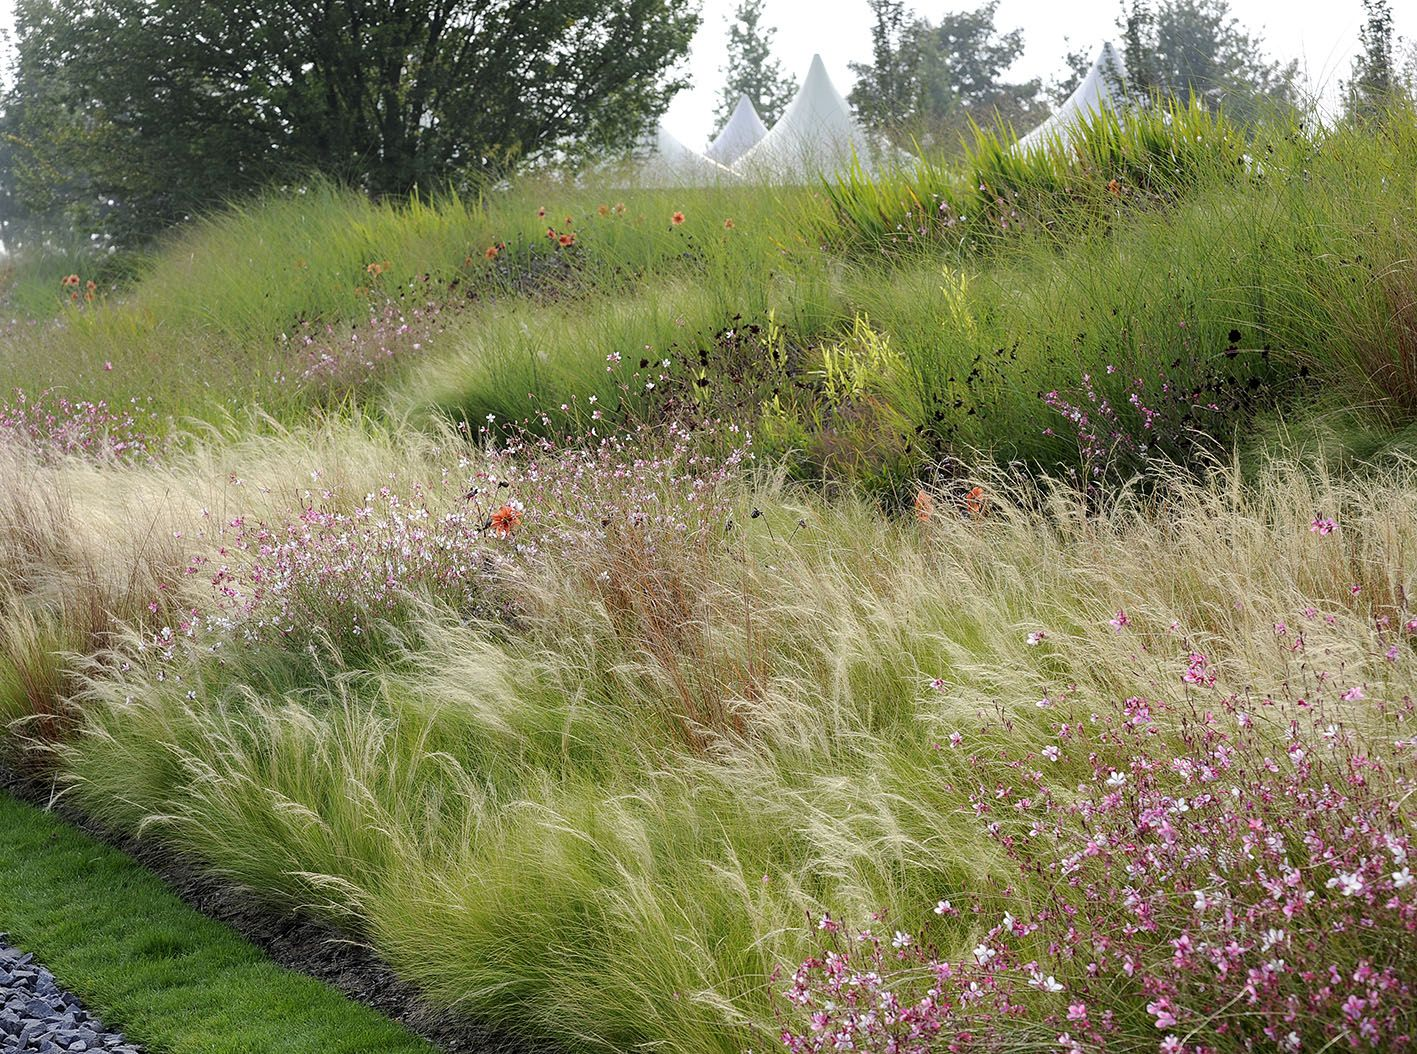 Gartenplanung peter janke gartenkonzepte hauseingang for Peter janke design mit pflanzen